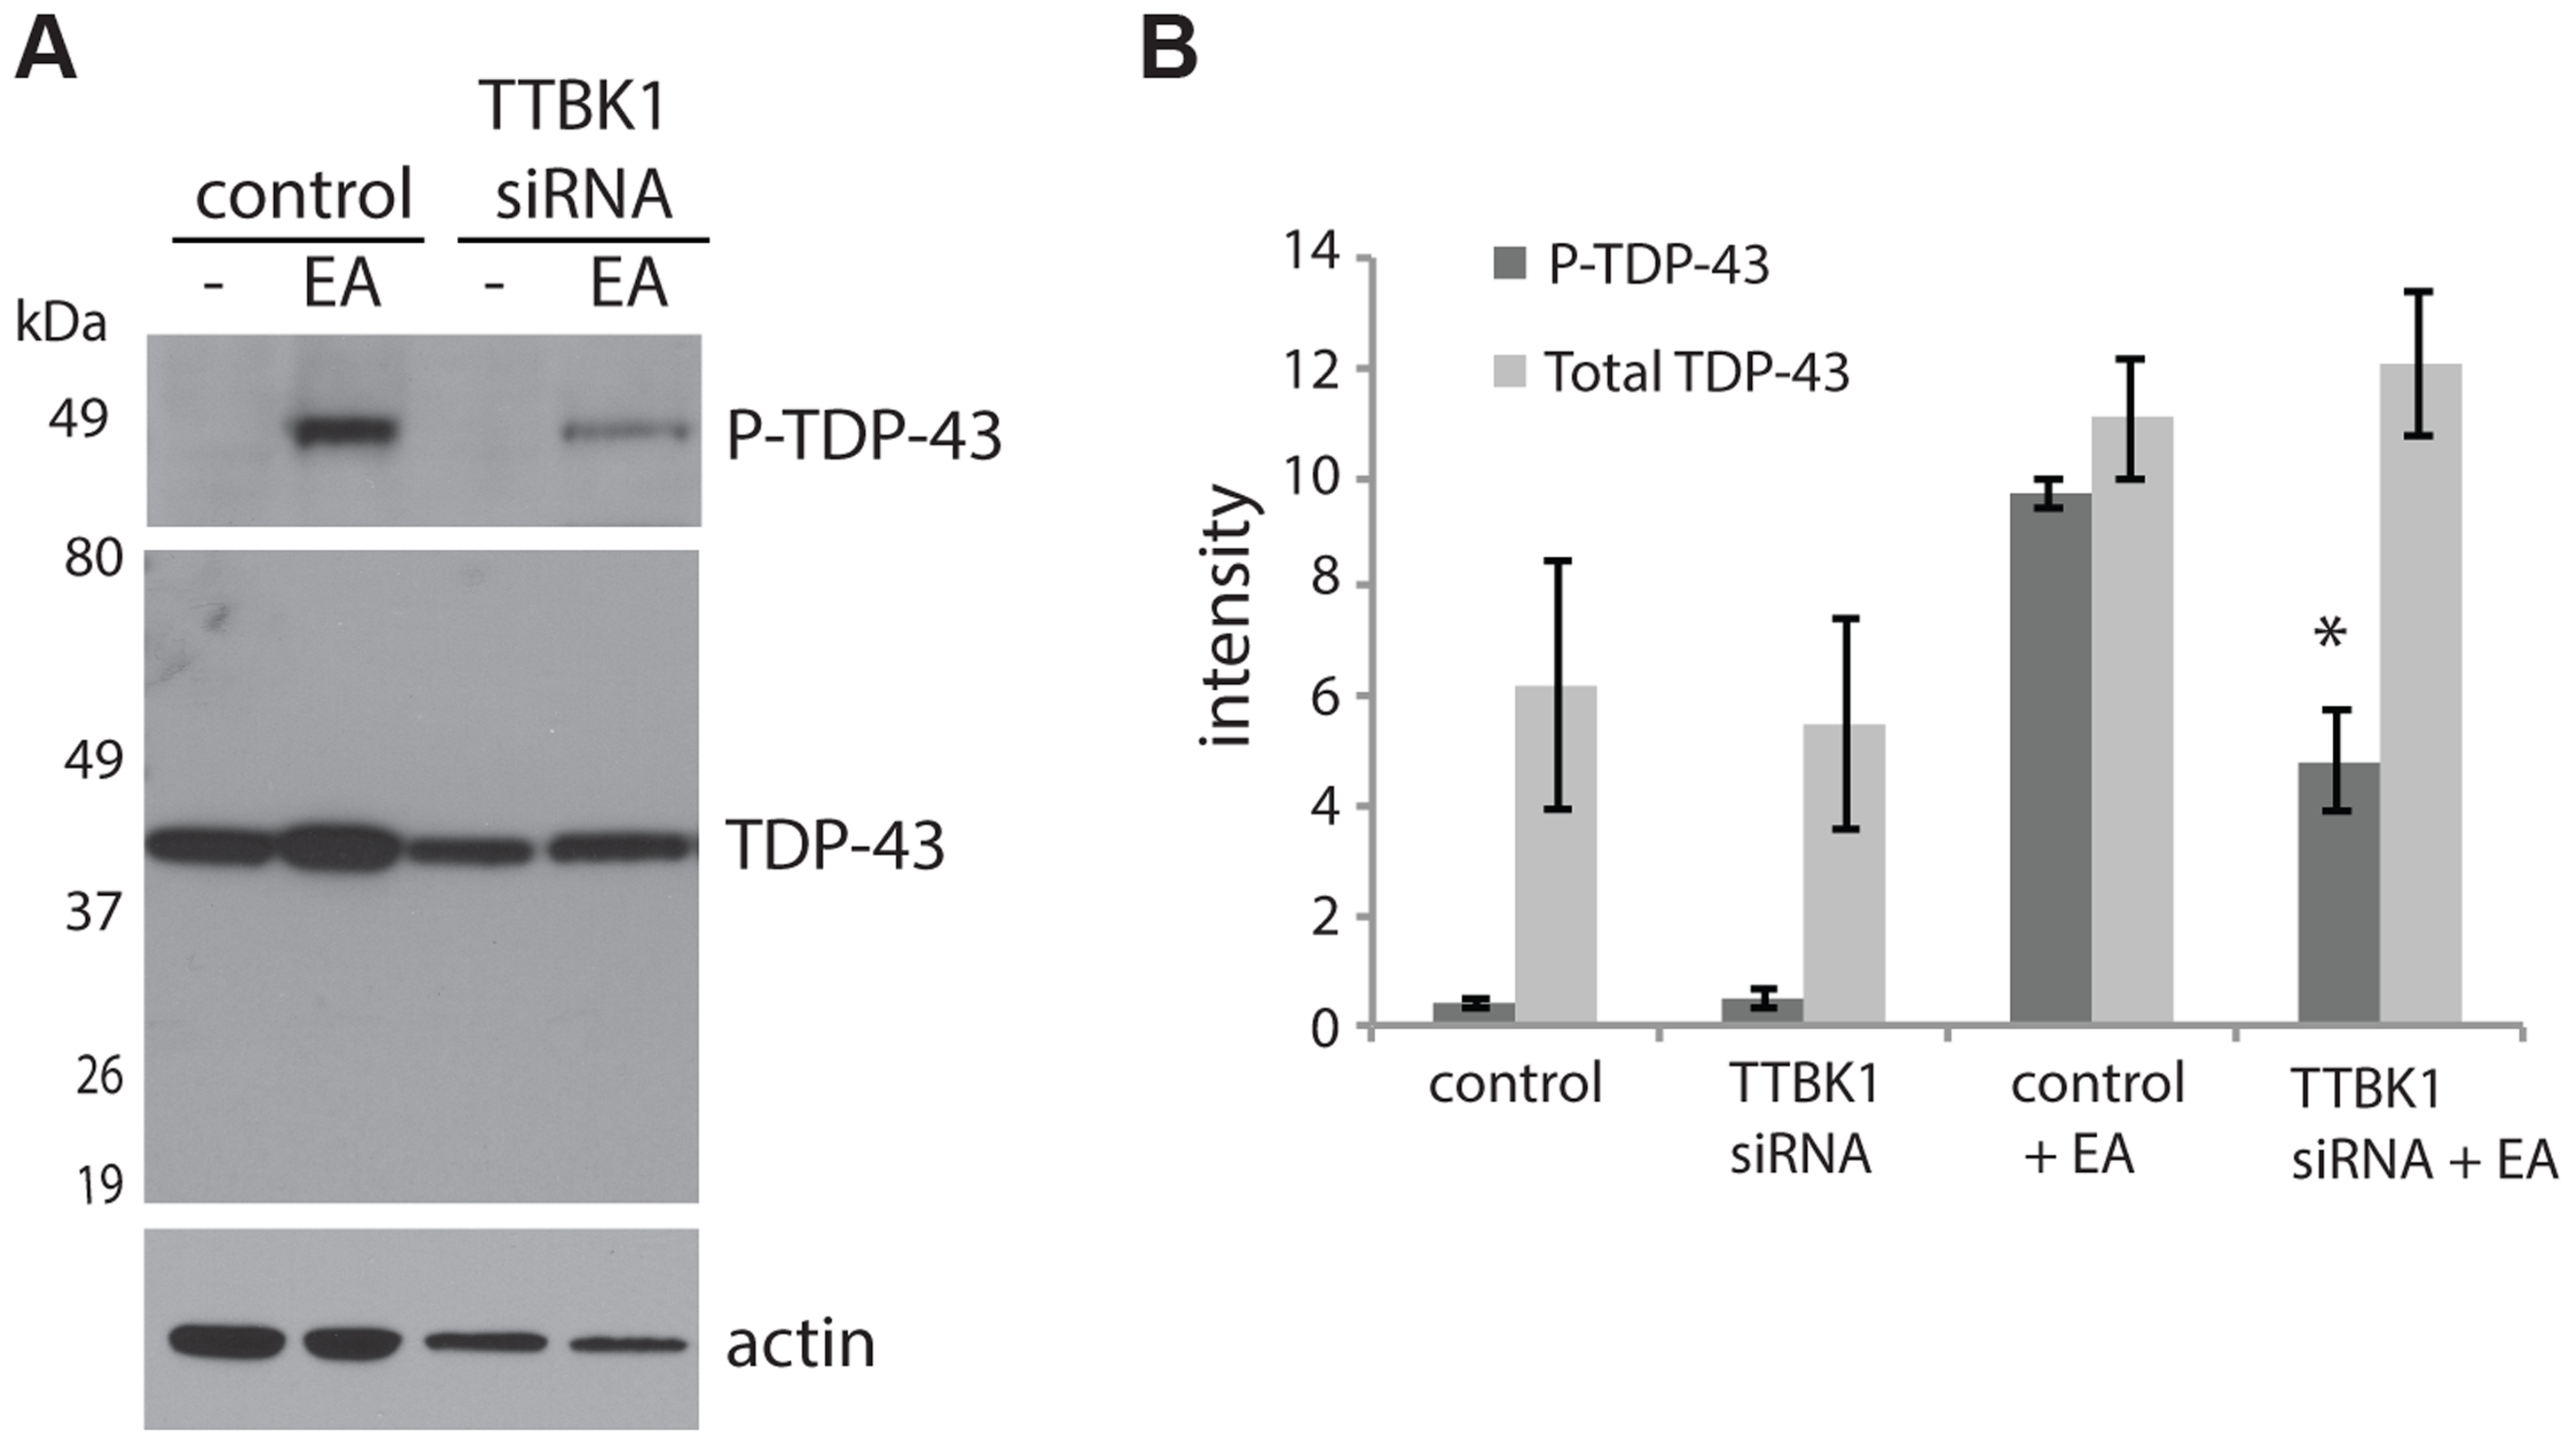 Reduced TTBK1 protects against TDP-43 phosphorylation.